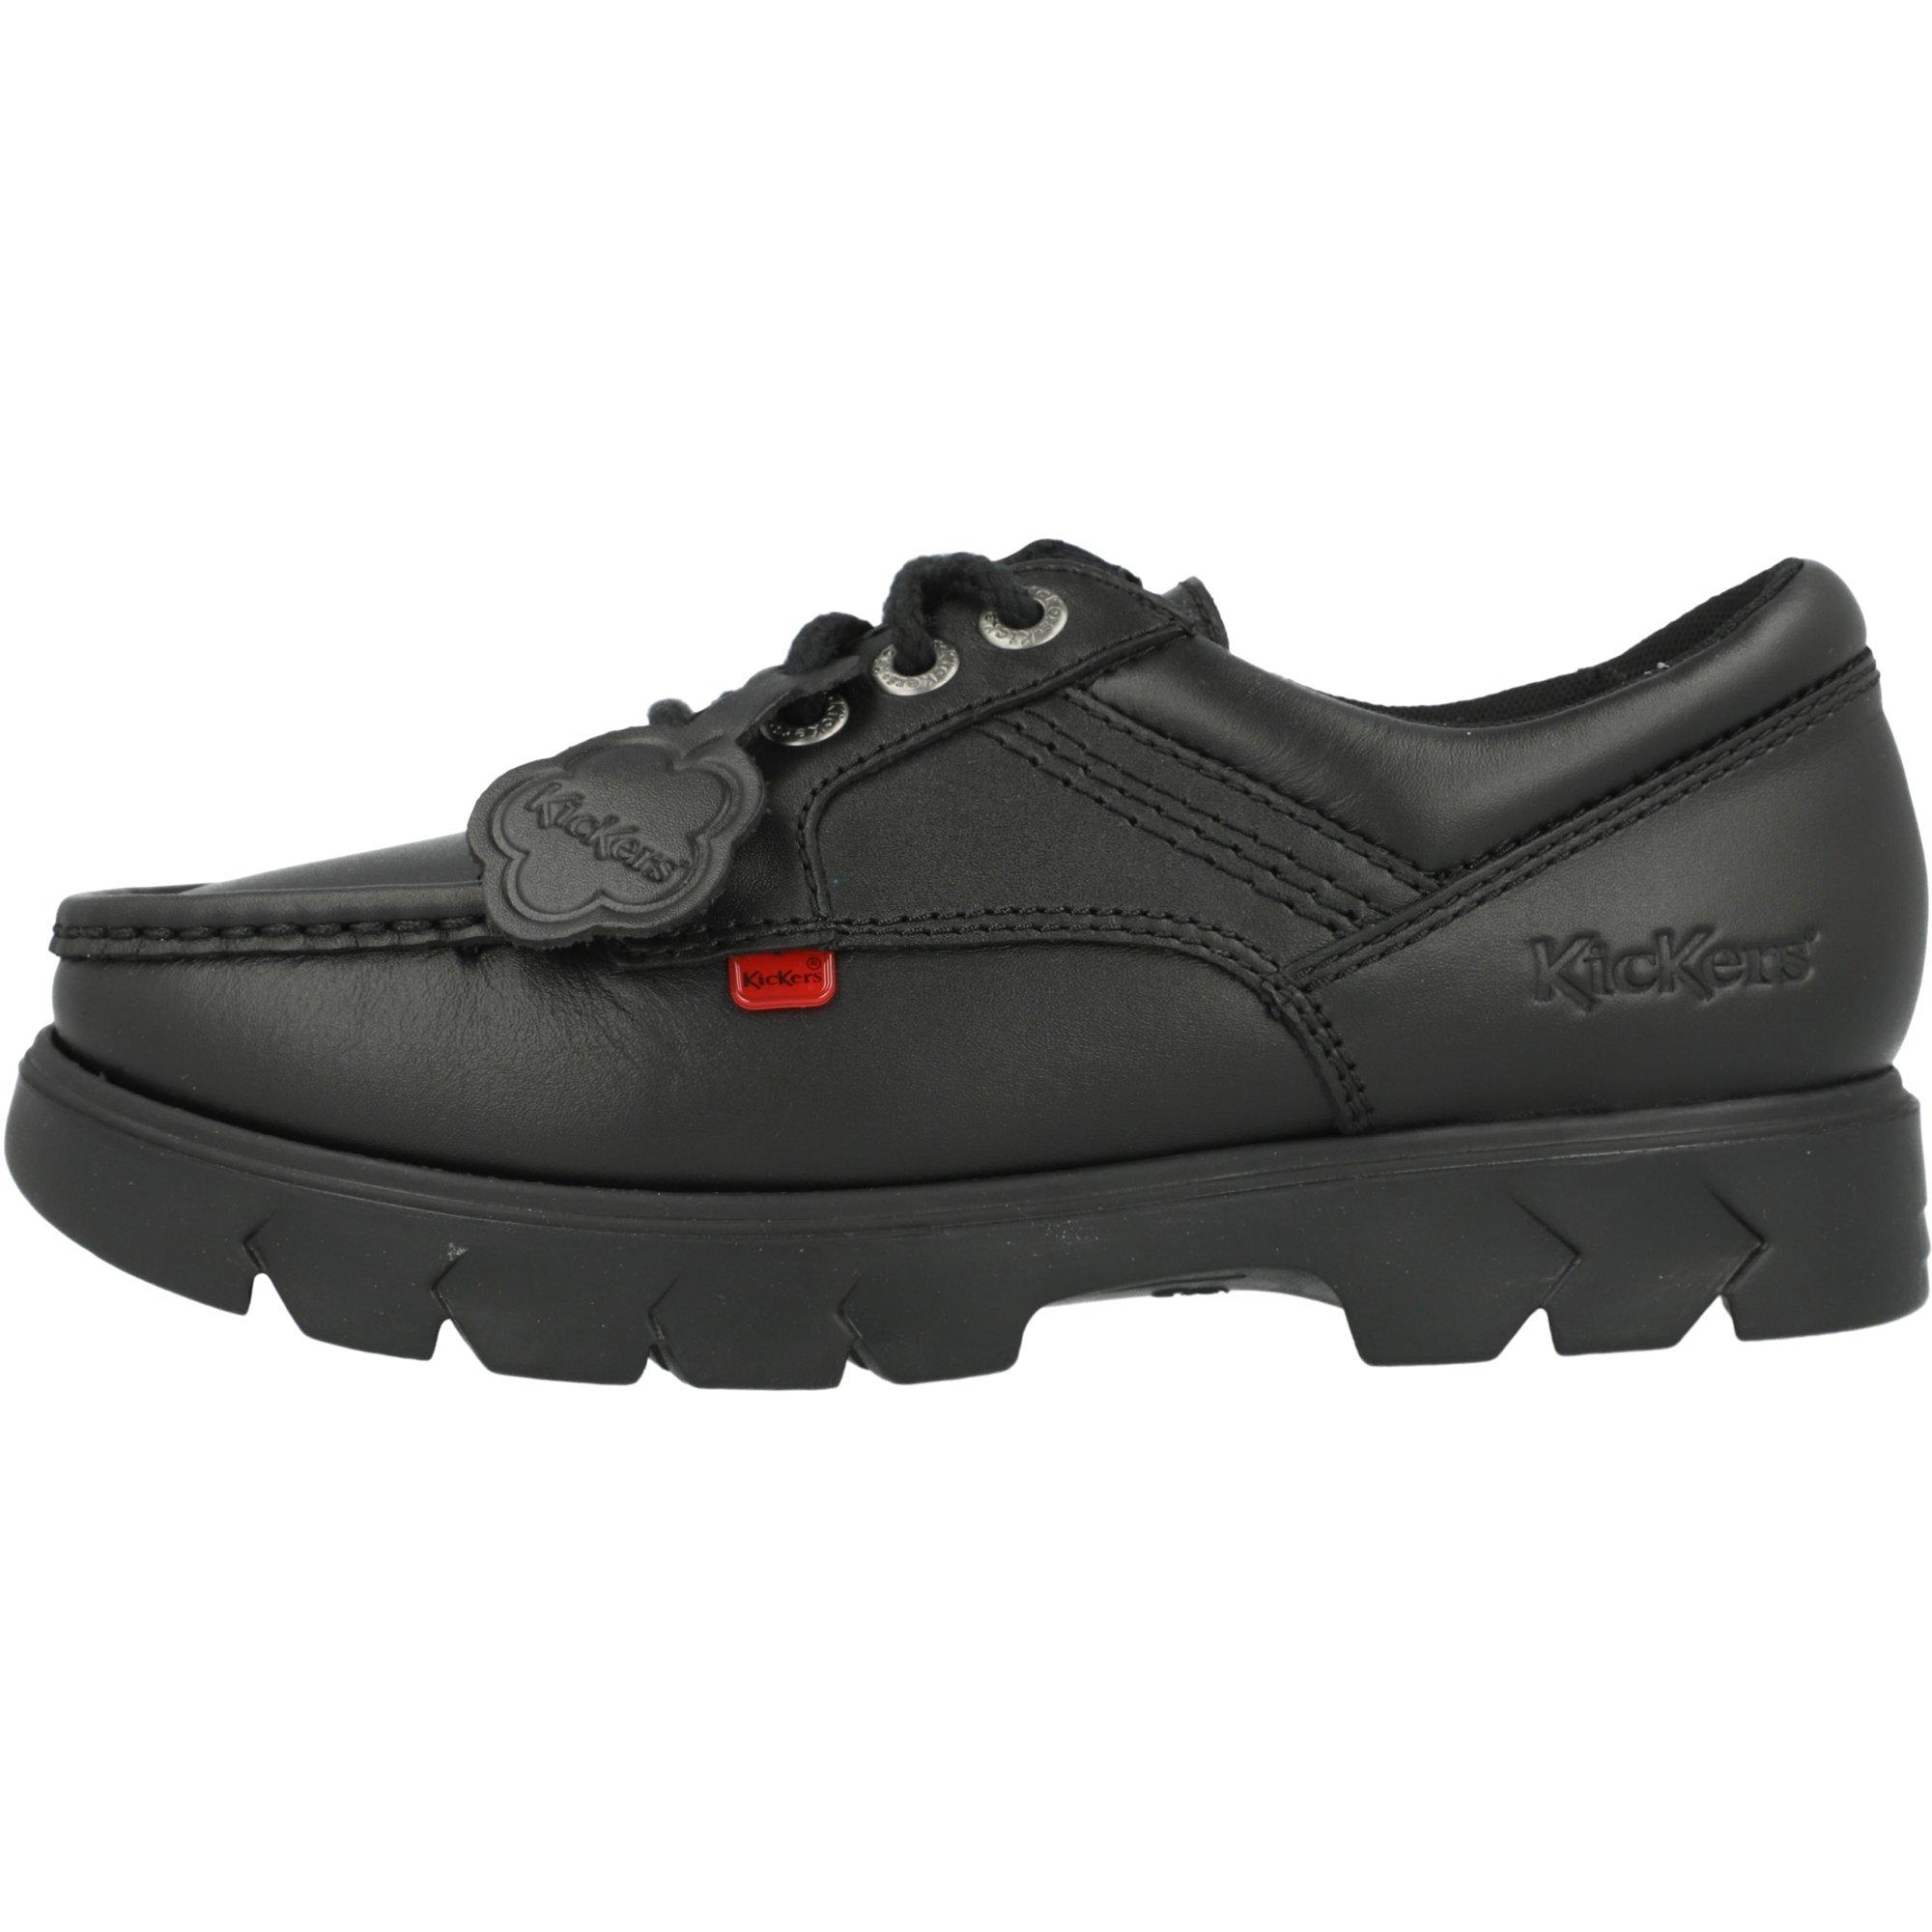 Kickers Lennon Lo Black Leather